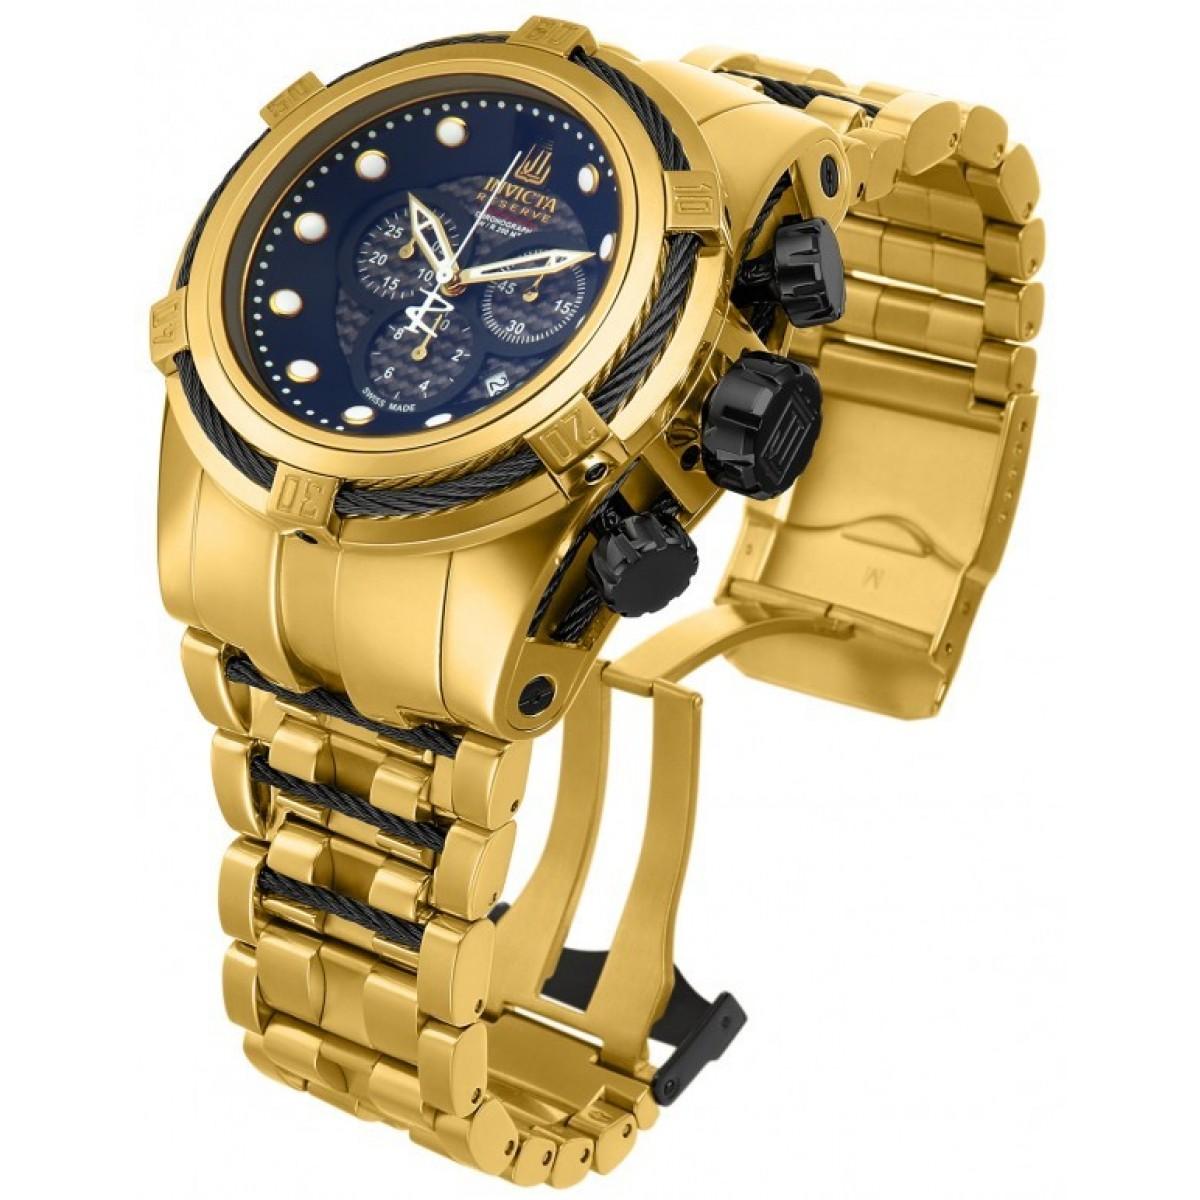 b4d1ea92293 Réplicas de relógios italianos.